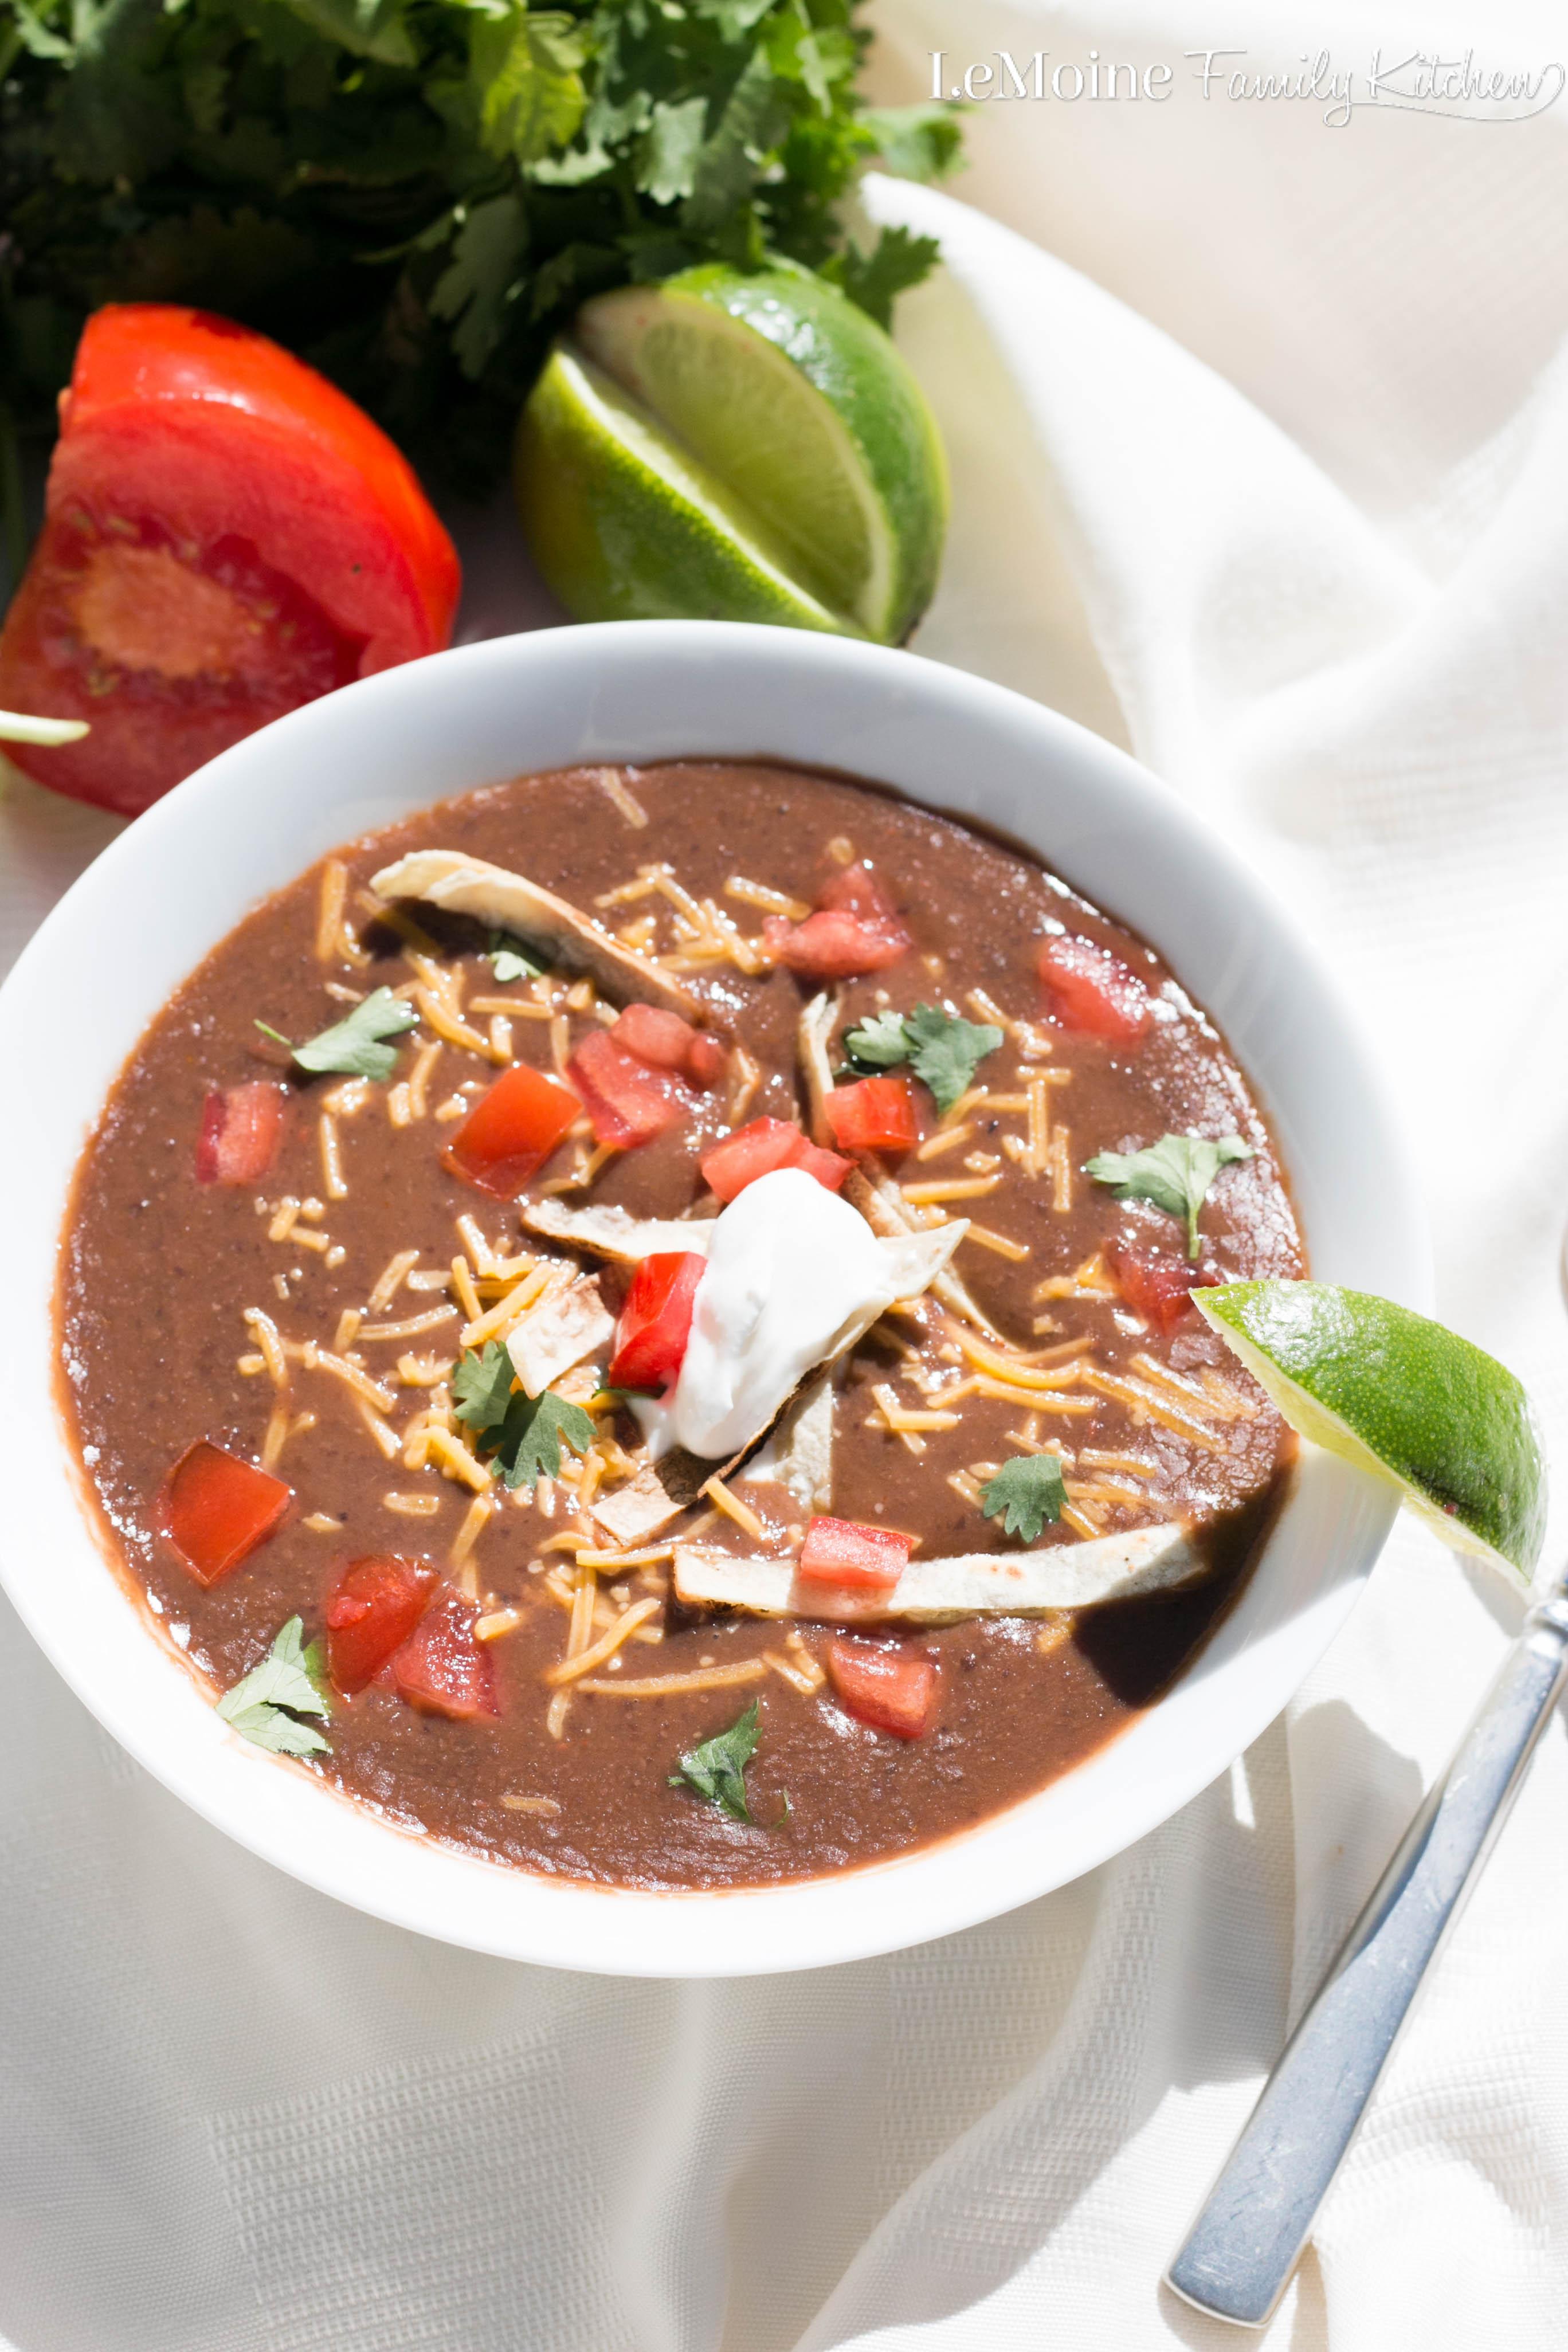 Easy black bean soup lemoine family kitchen How to make healthy soup for dinner